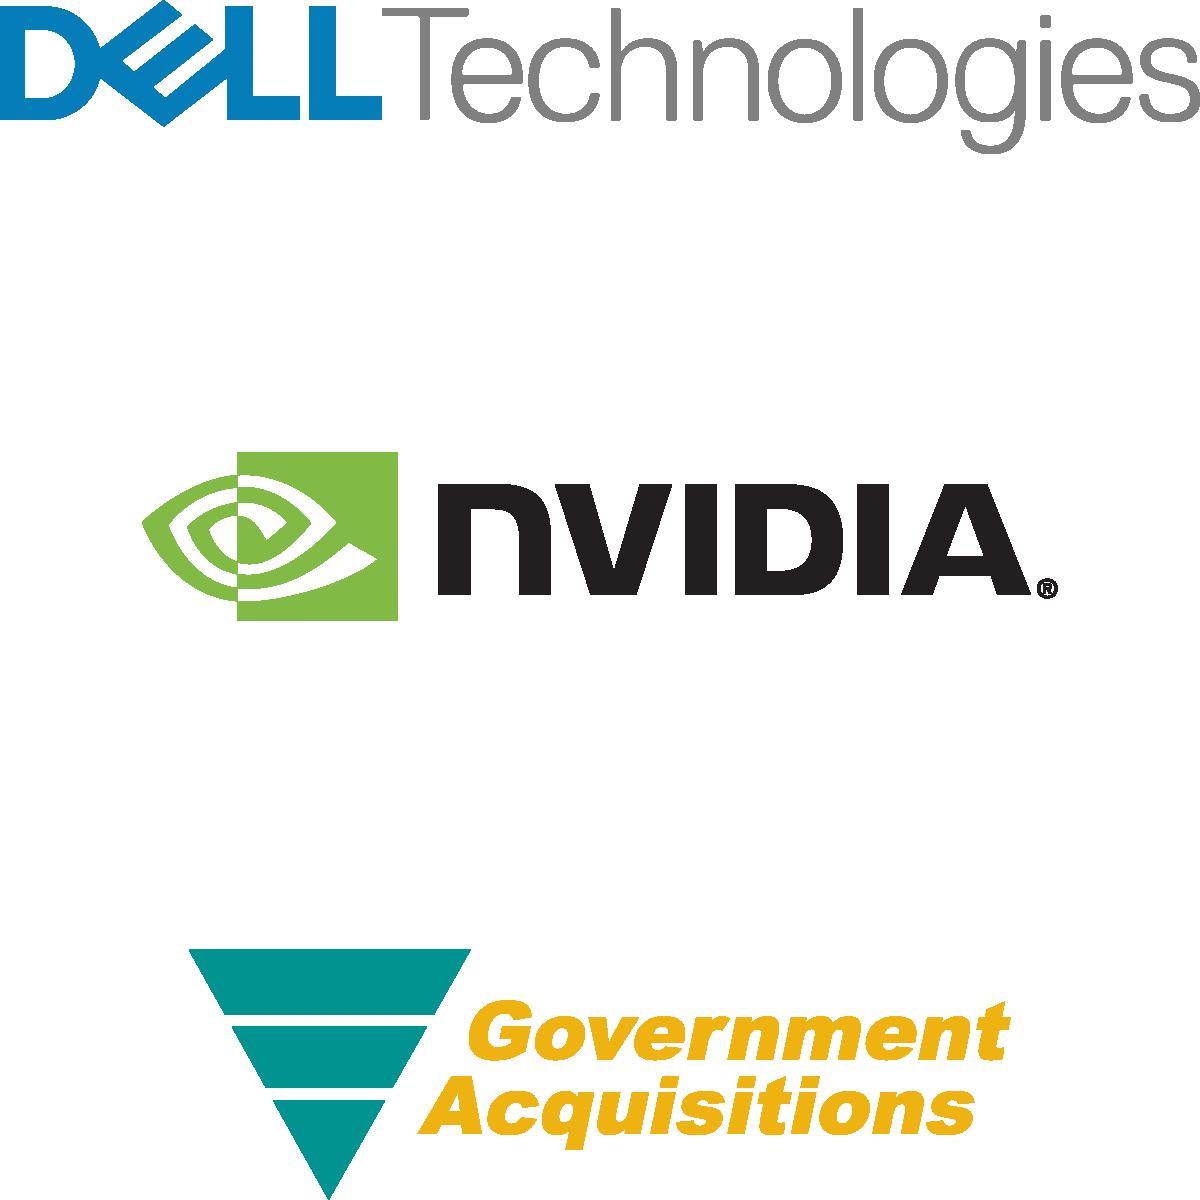 Dell Technologies   NVIDIA   GAI's logo